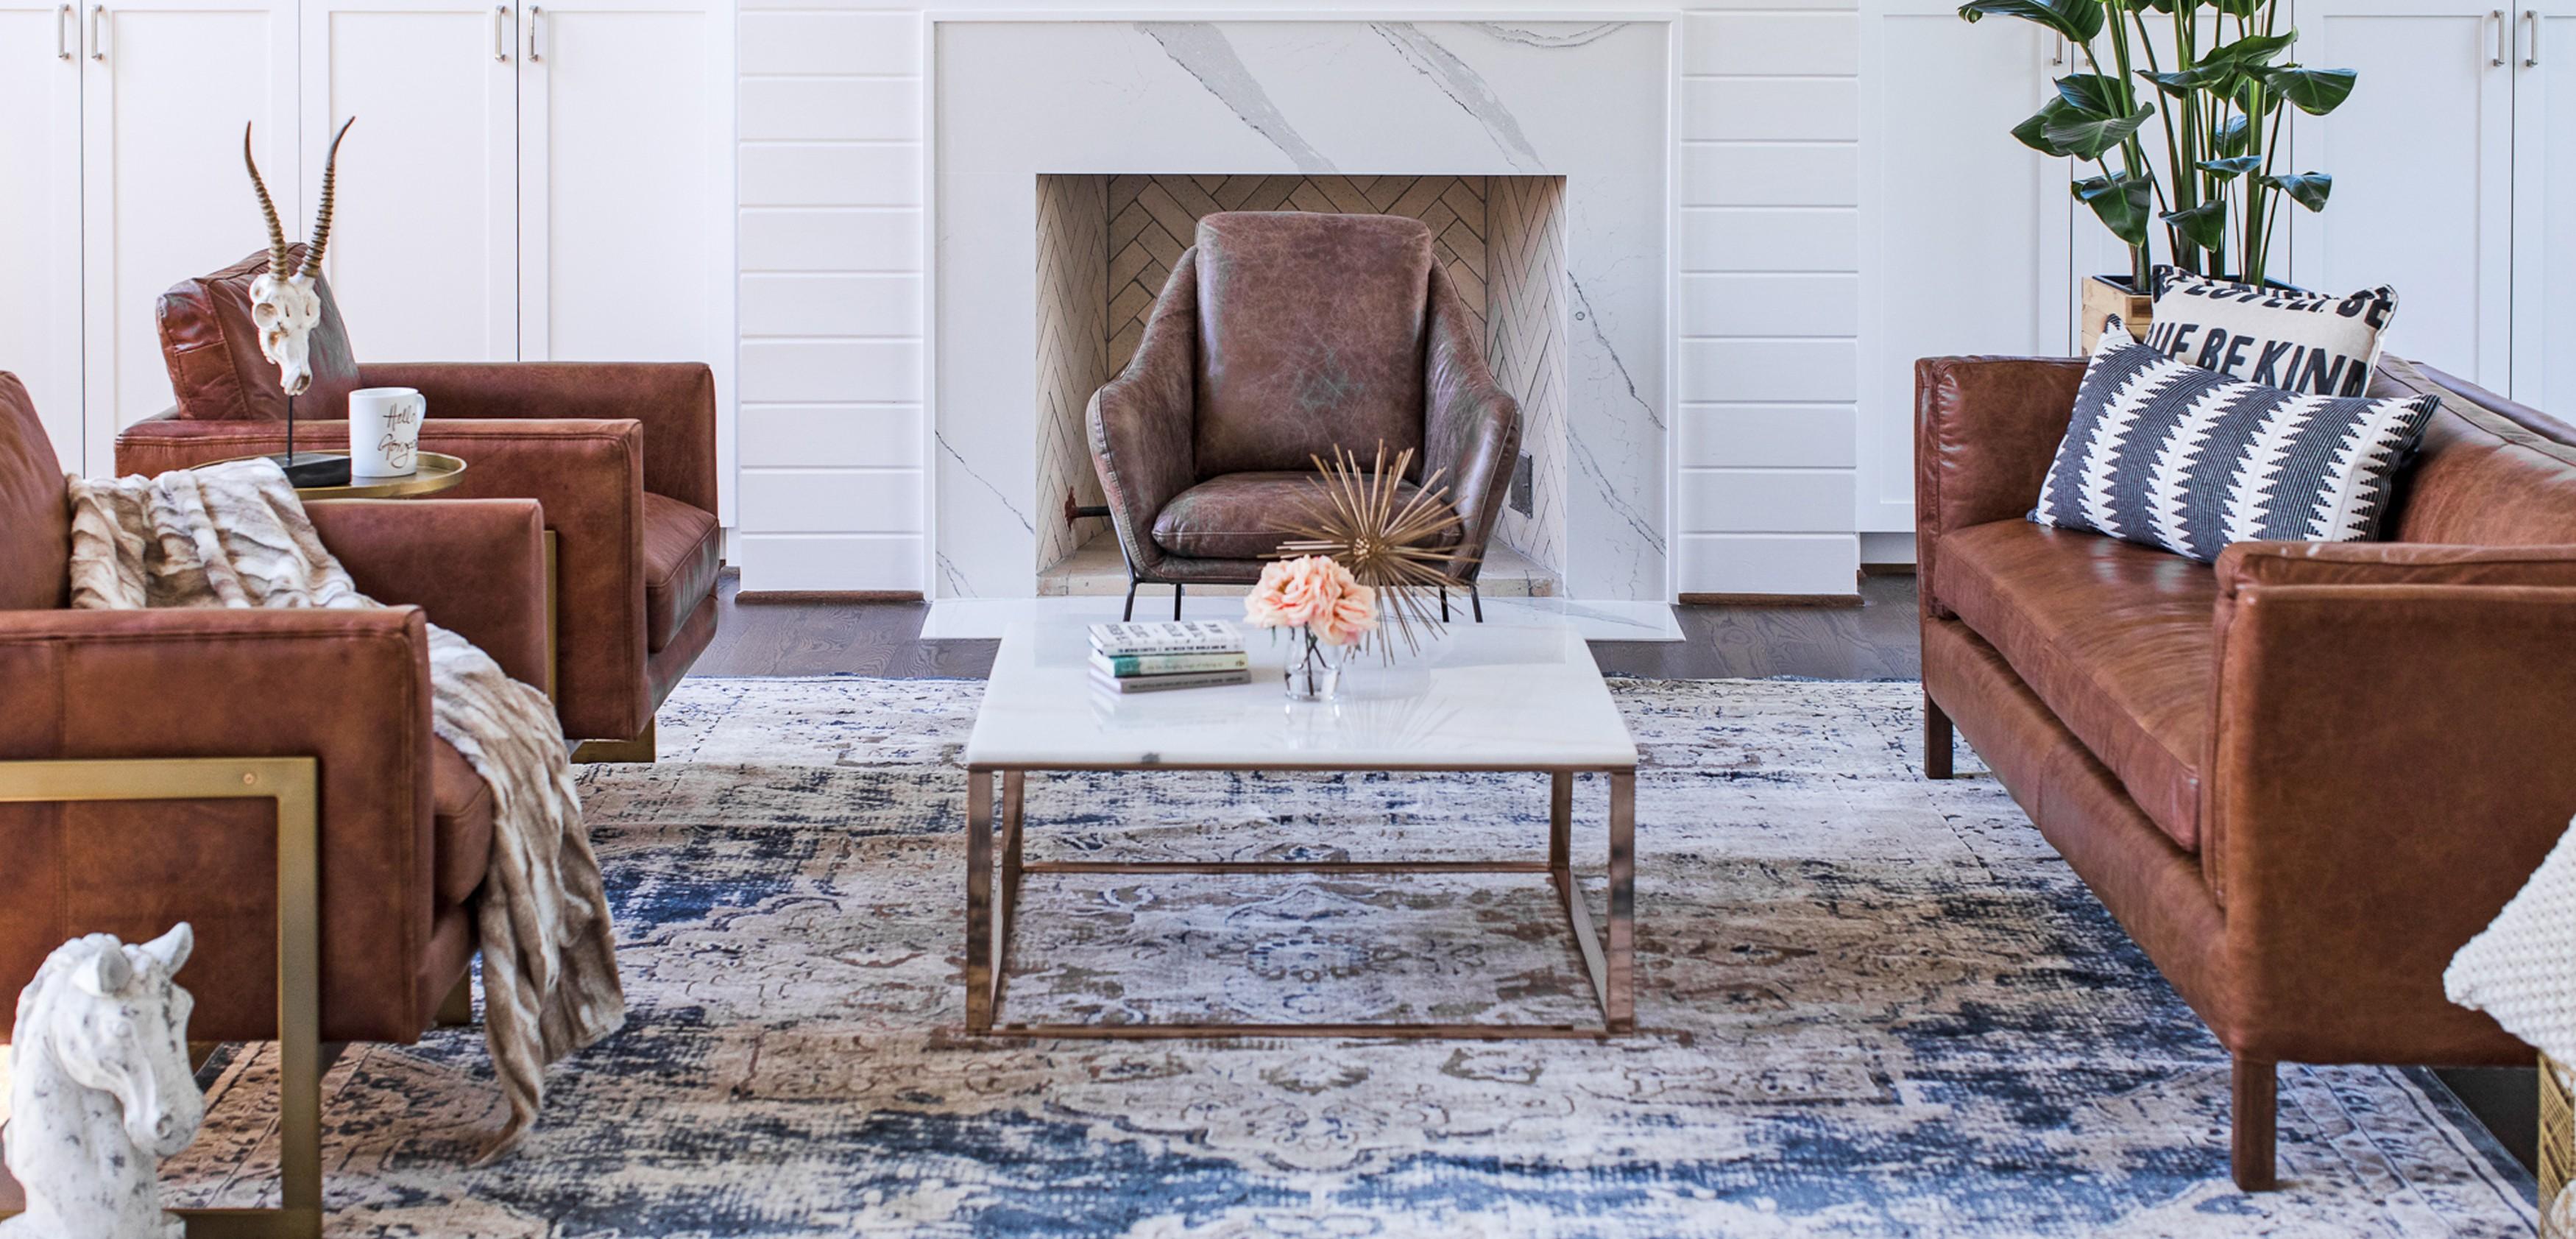 Edloe Finch Furniture Co Linkedin